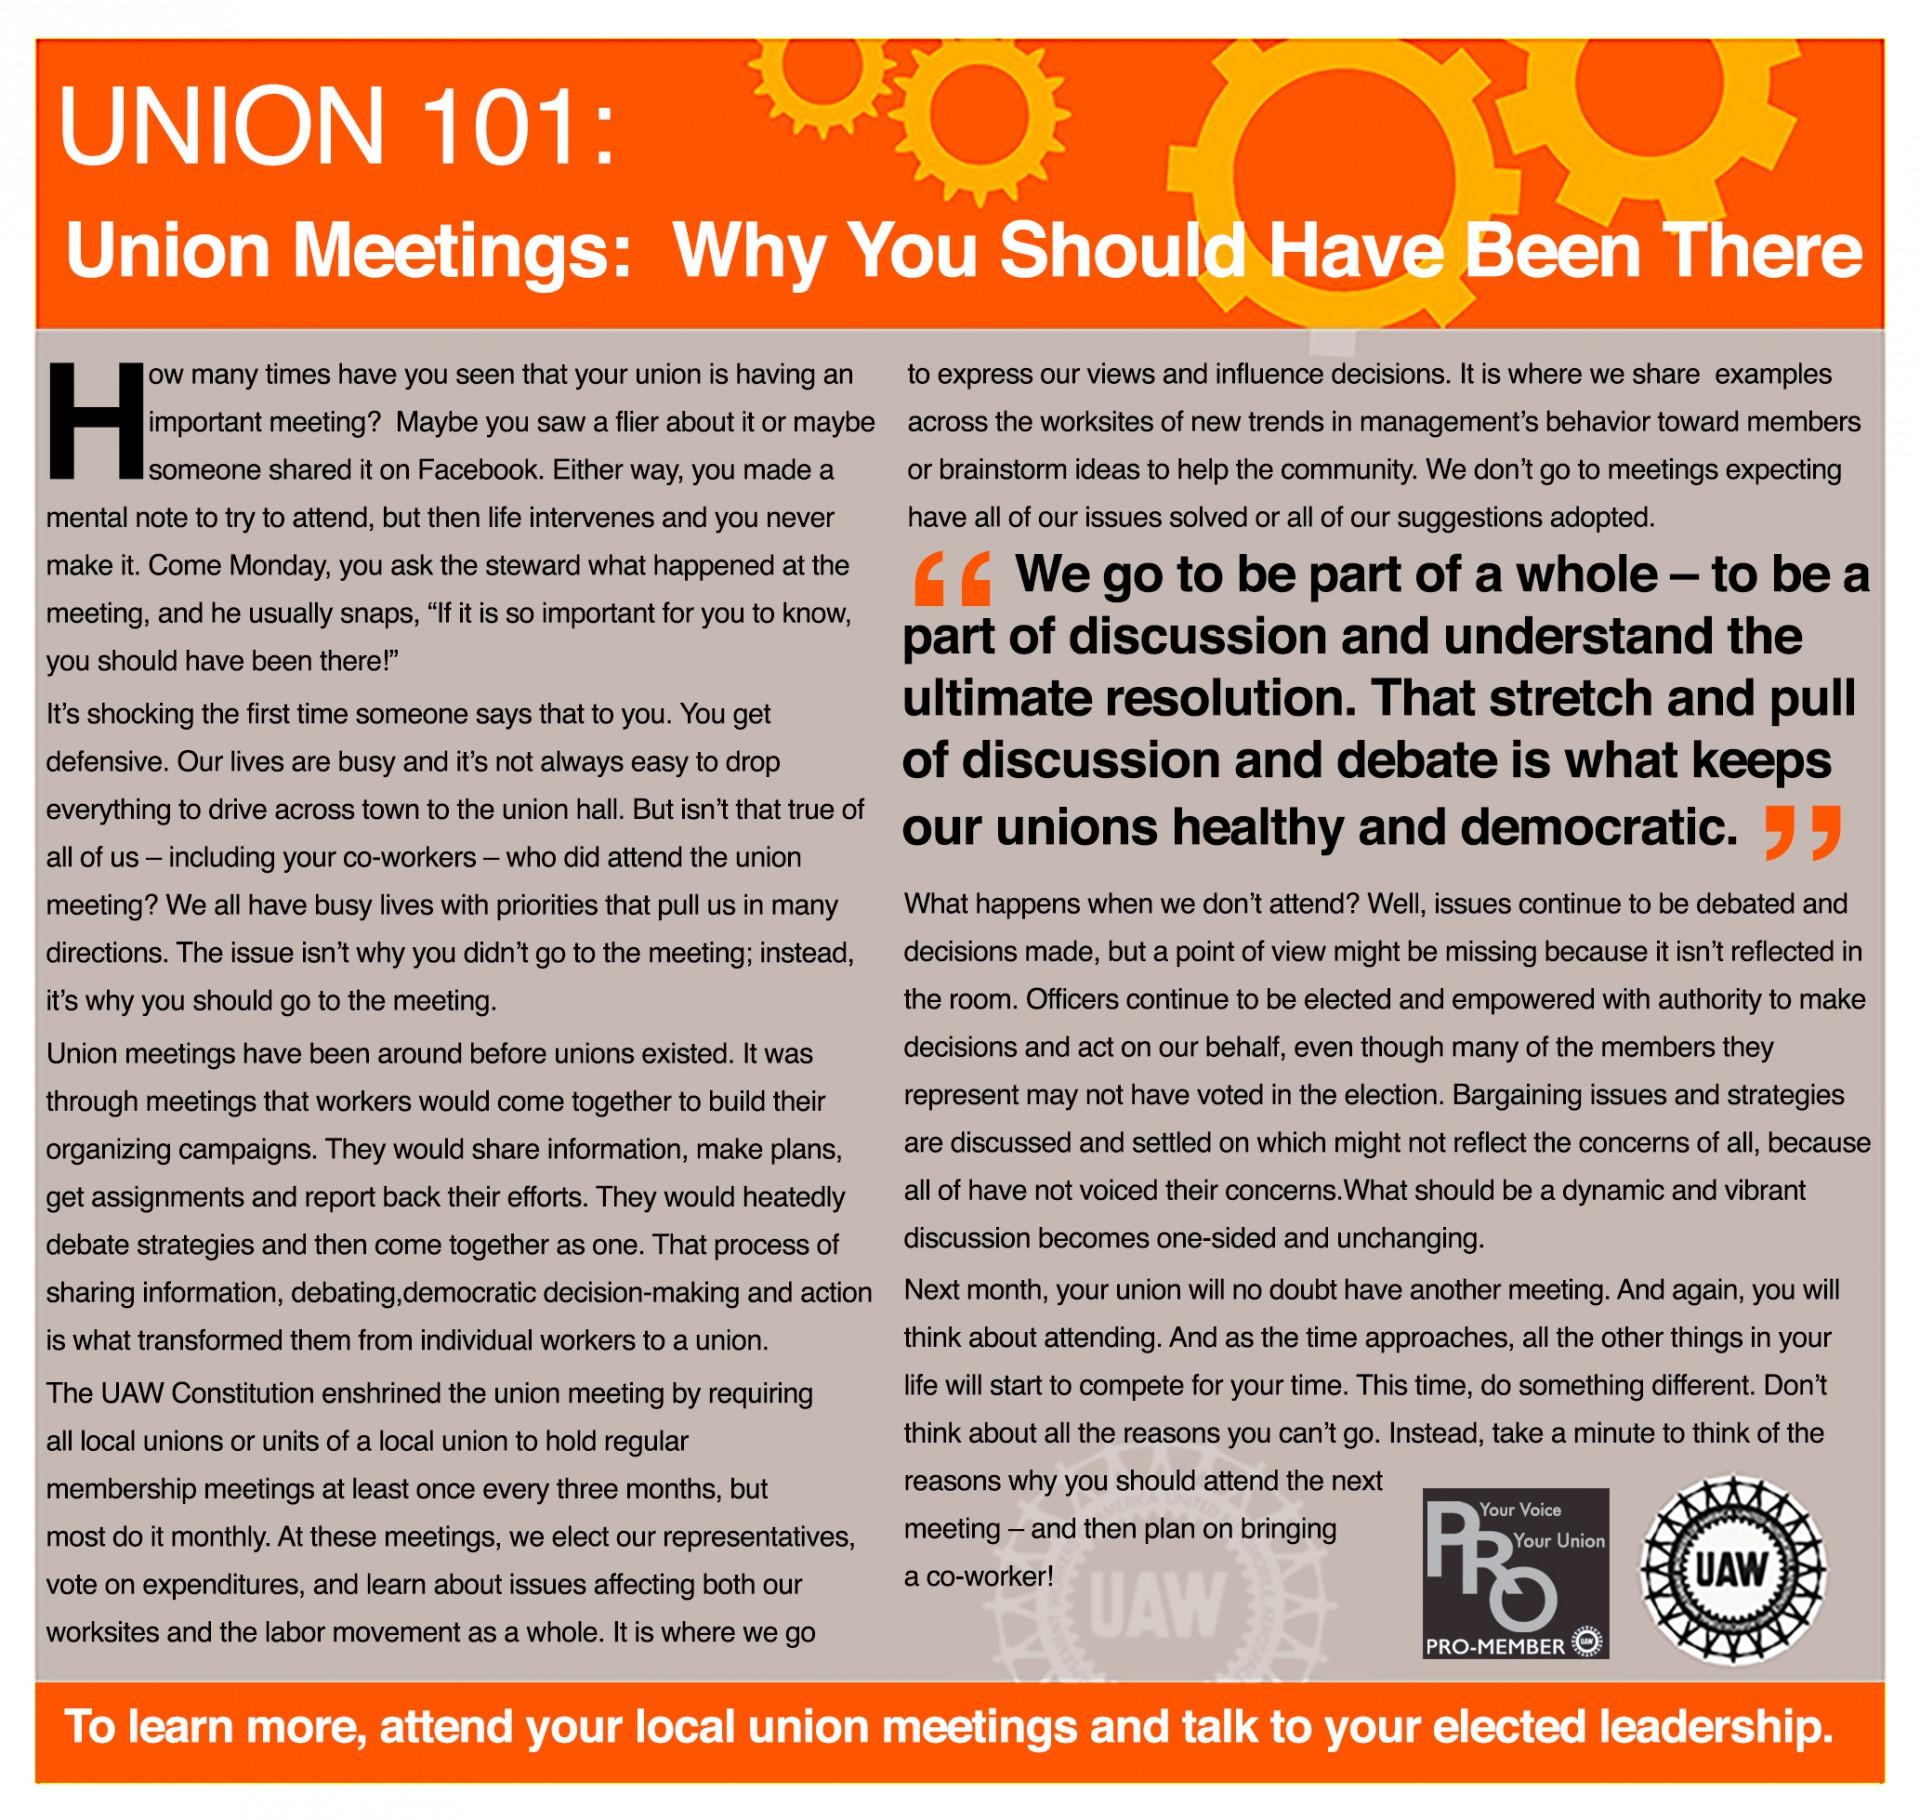 union 101